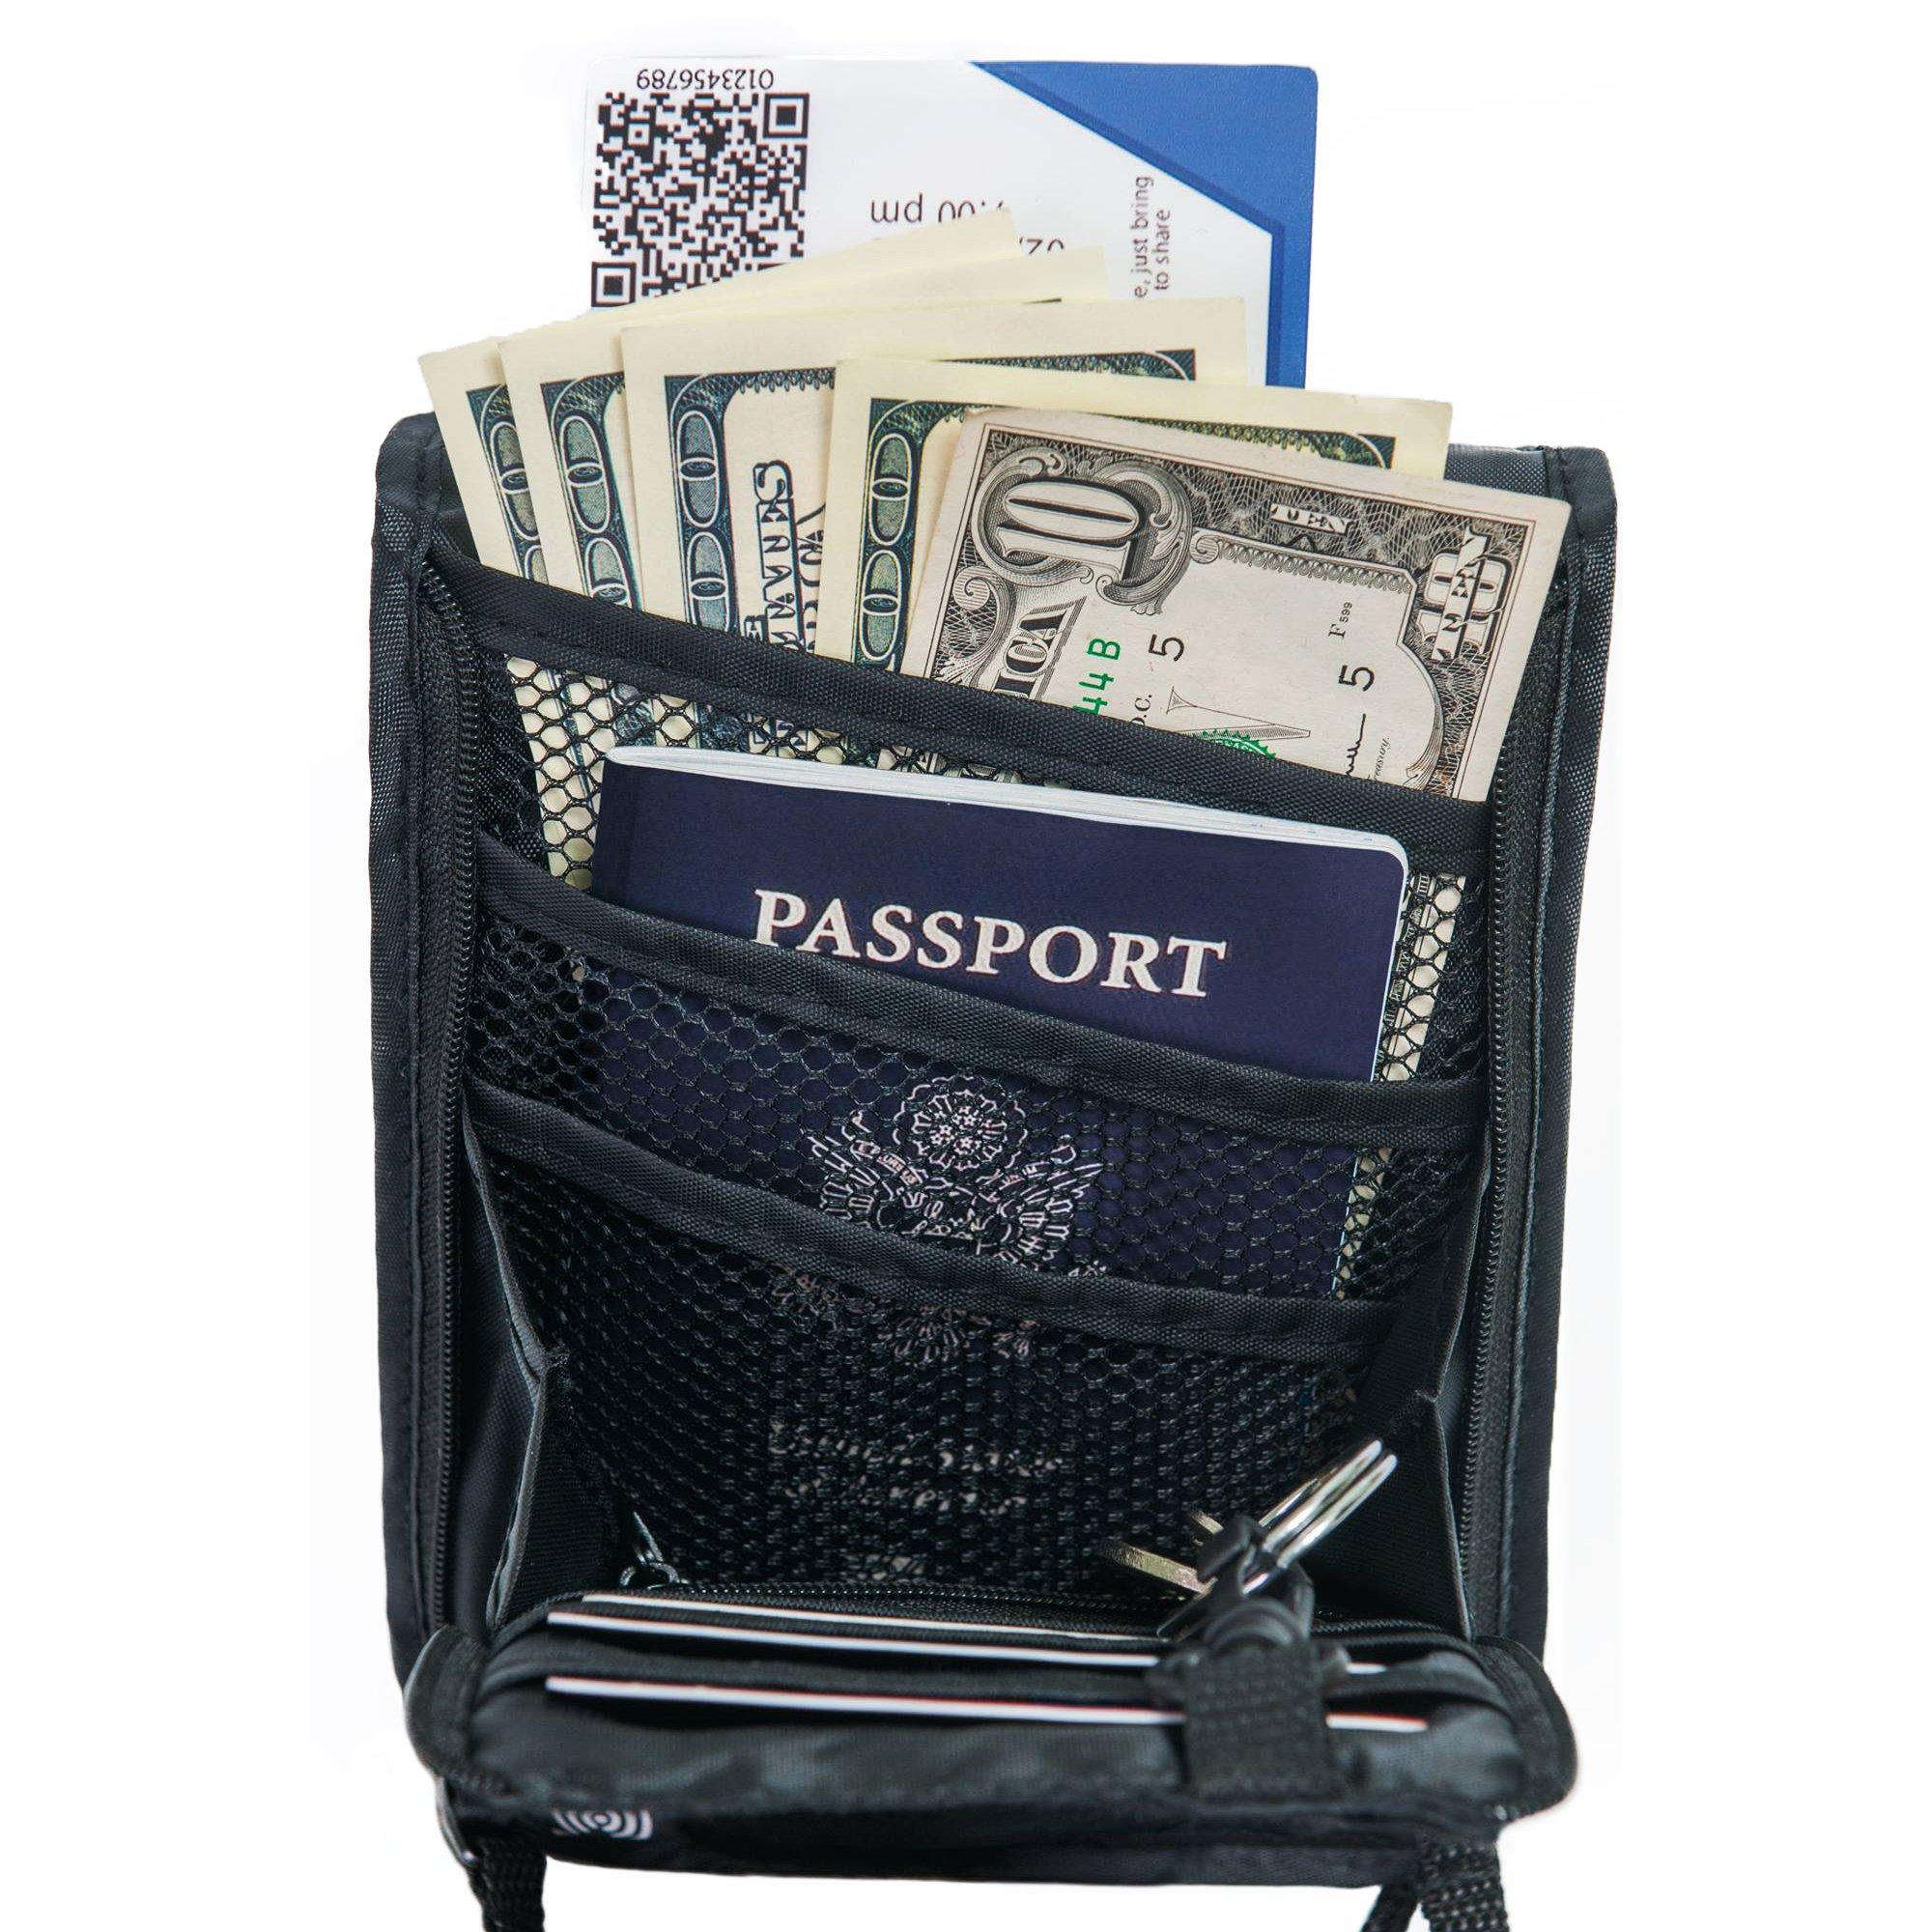 Travel Wallet-holder-Neck Pouch-Anti-Theft-RFID Blocking-Traveling Accessories